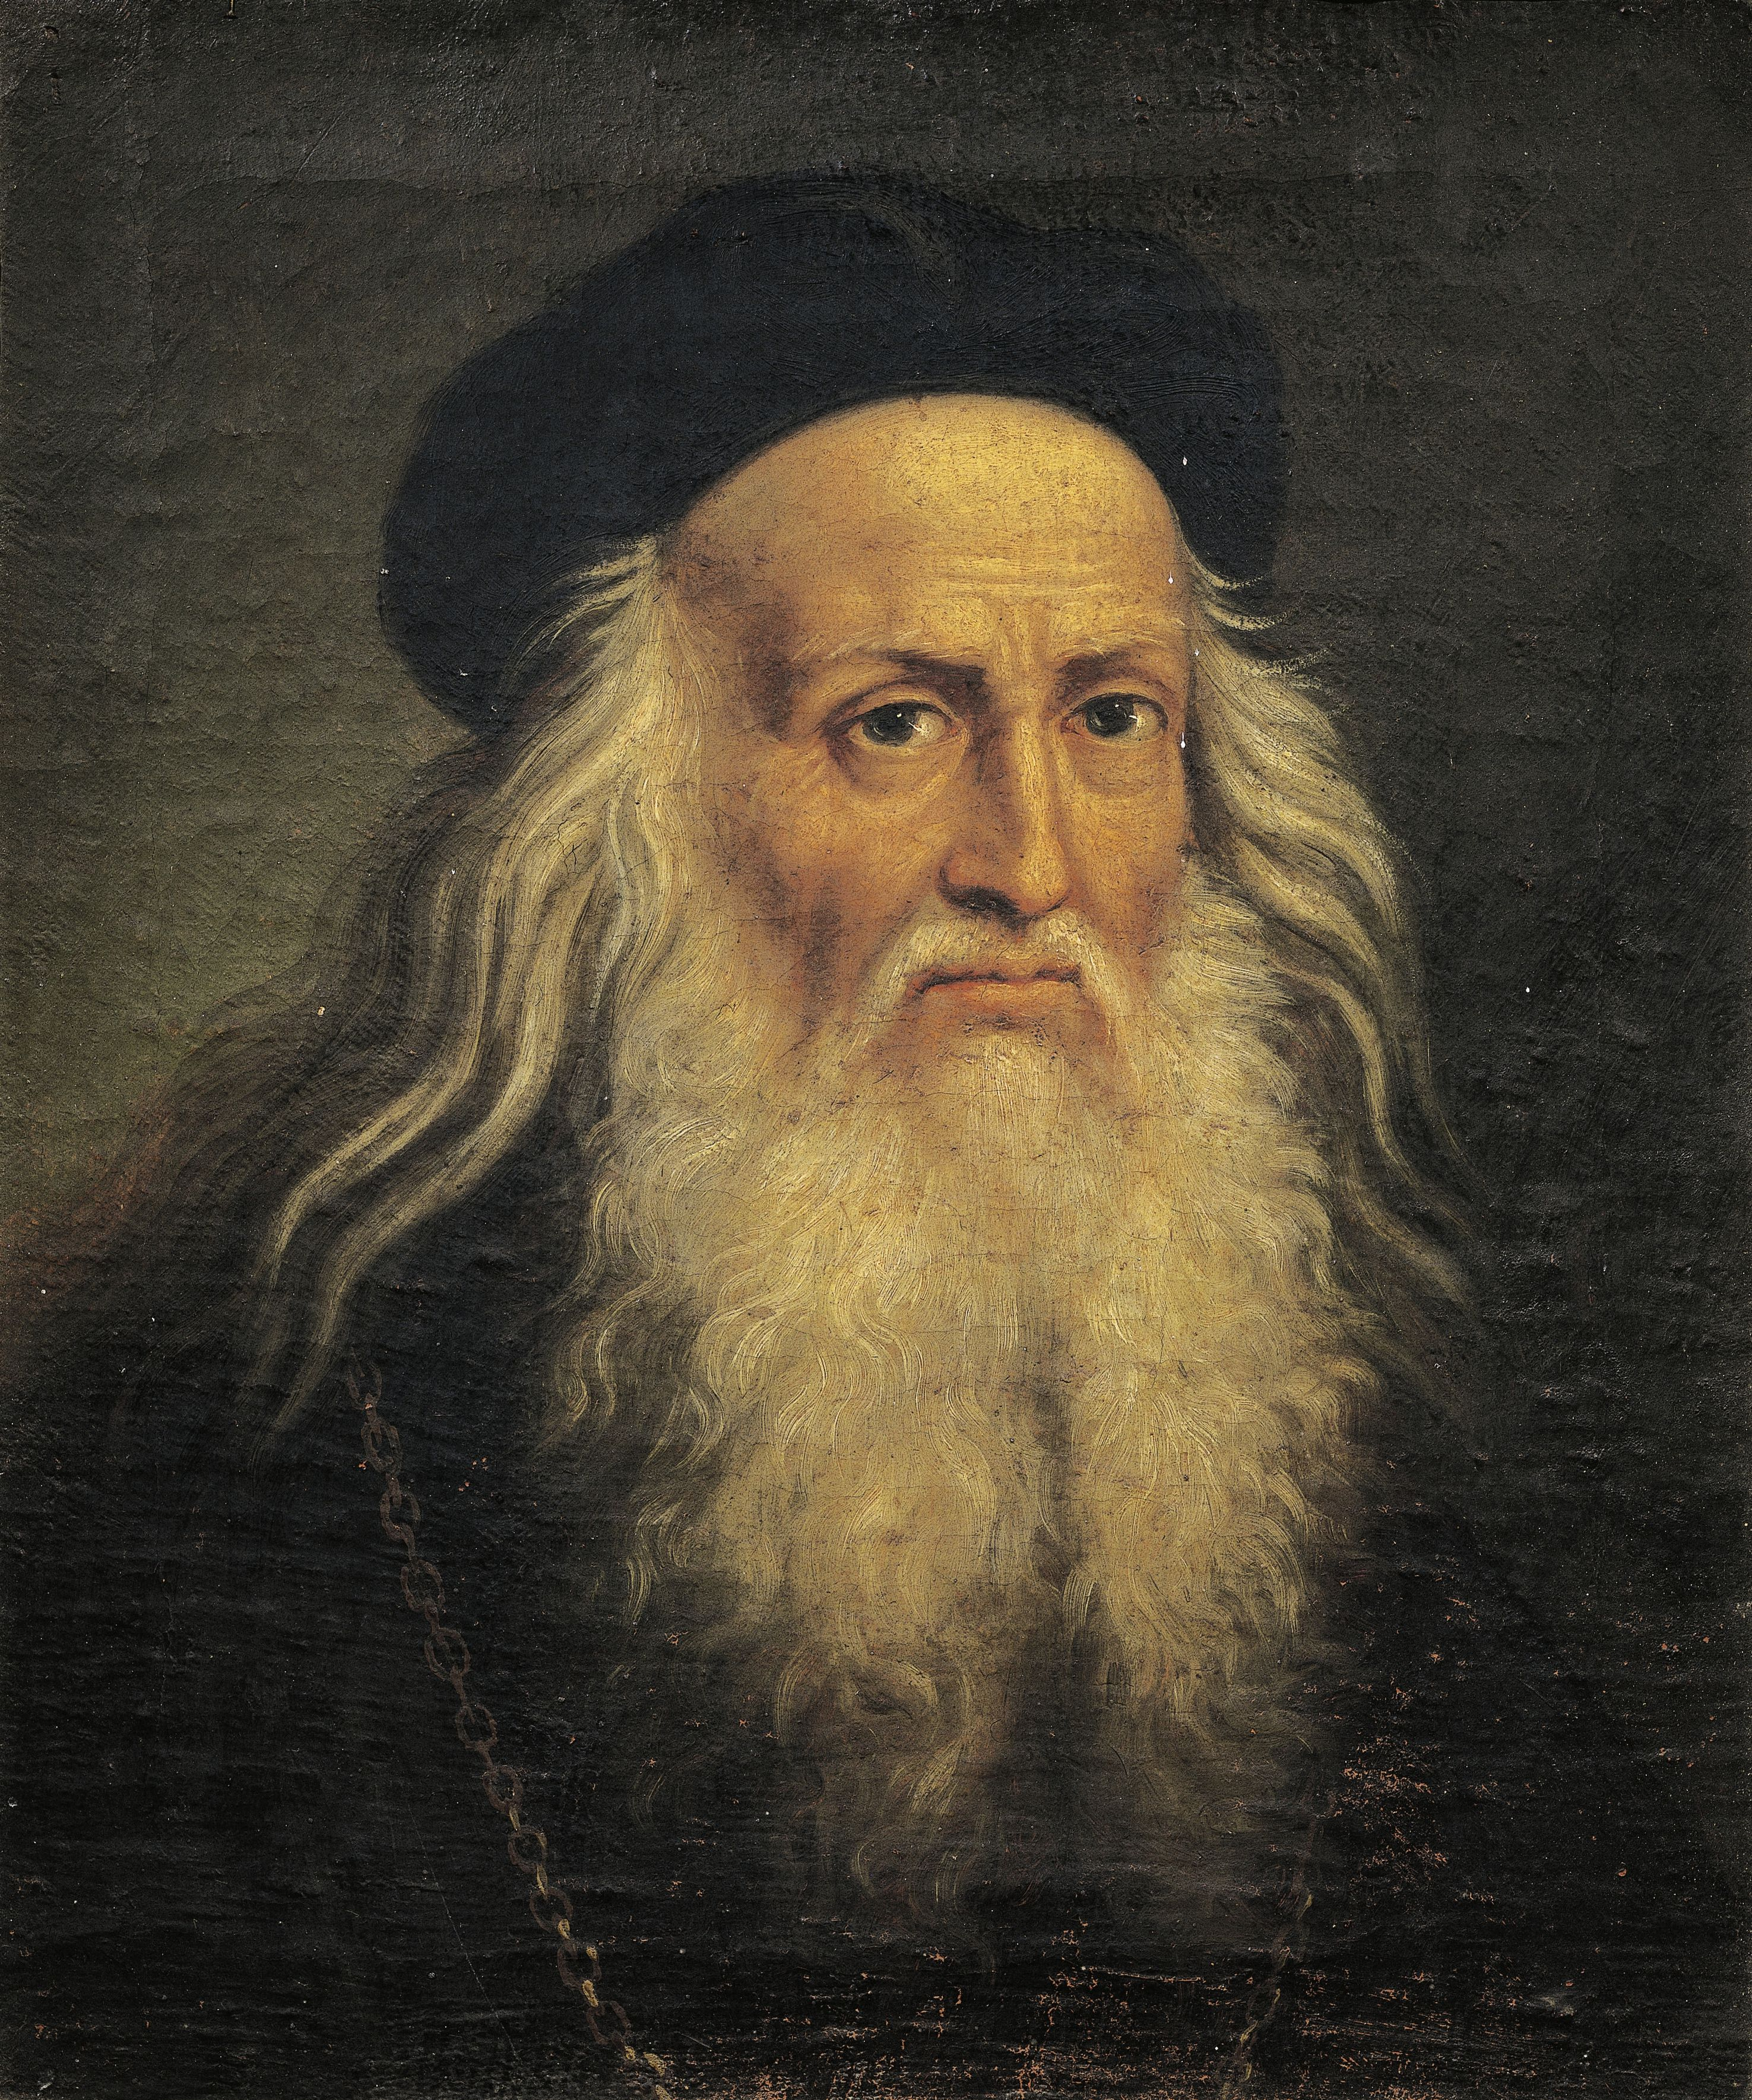 What Was Leonardo's Real Name?